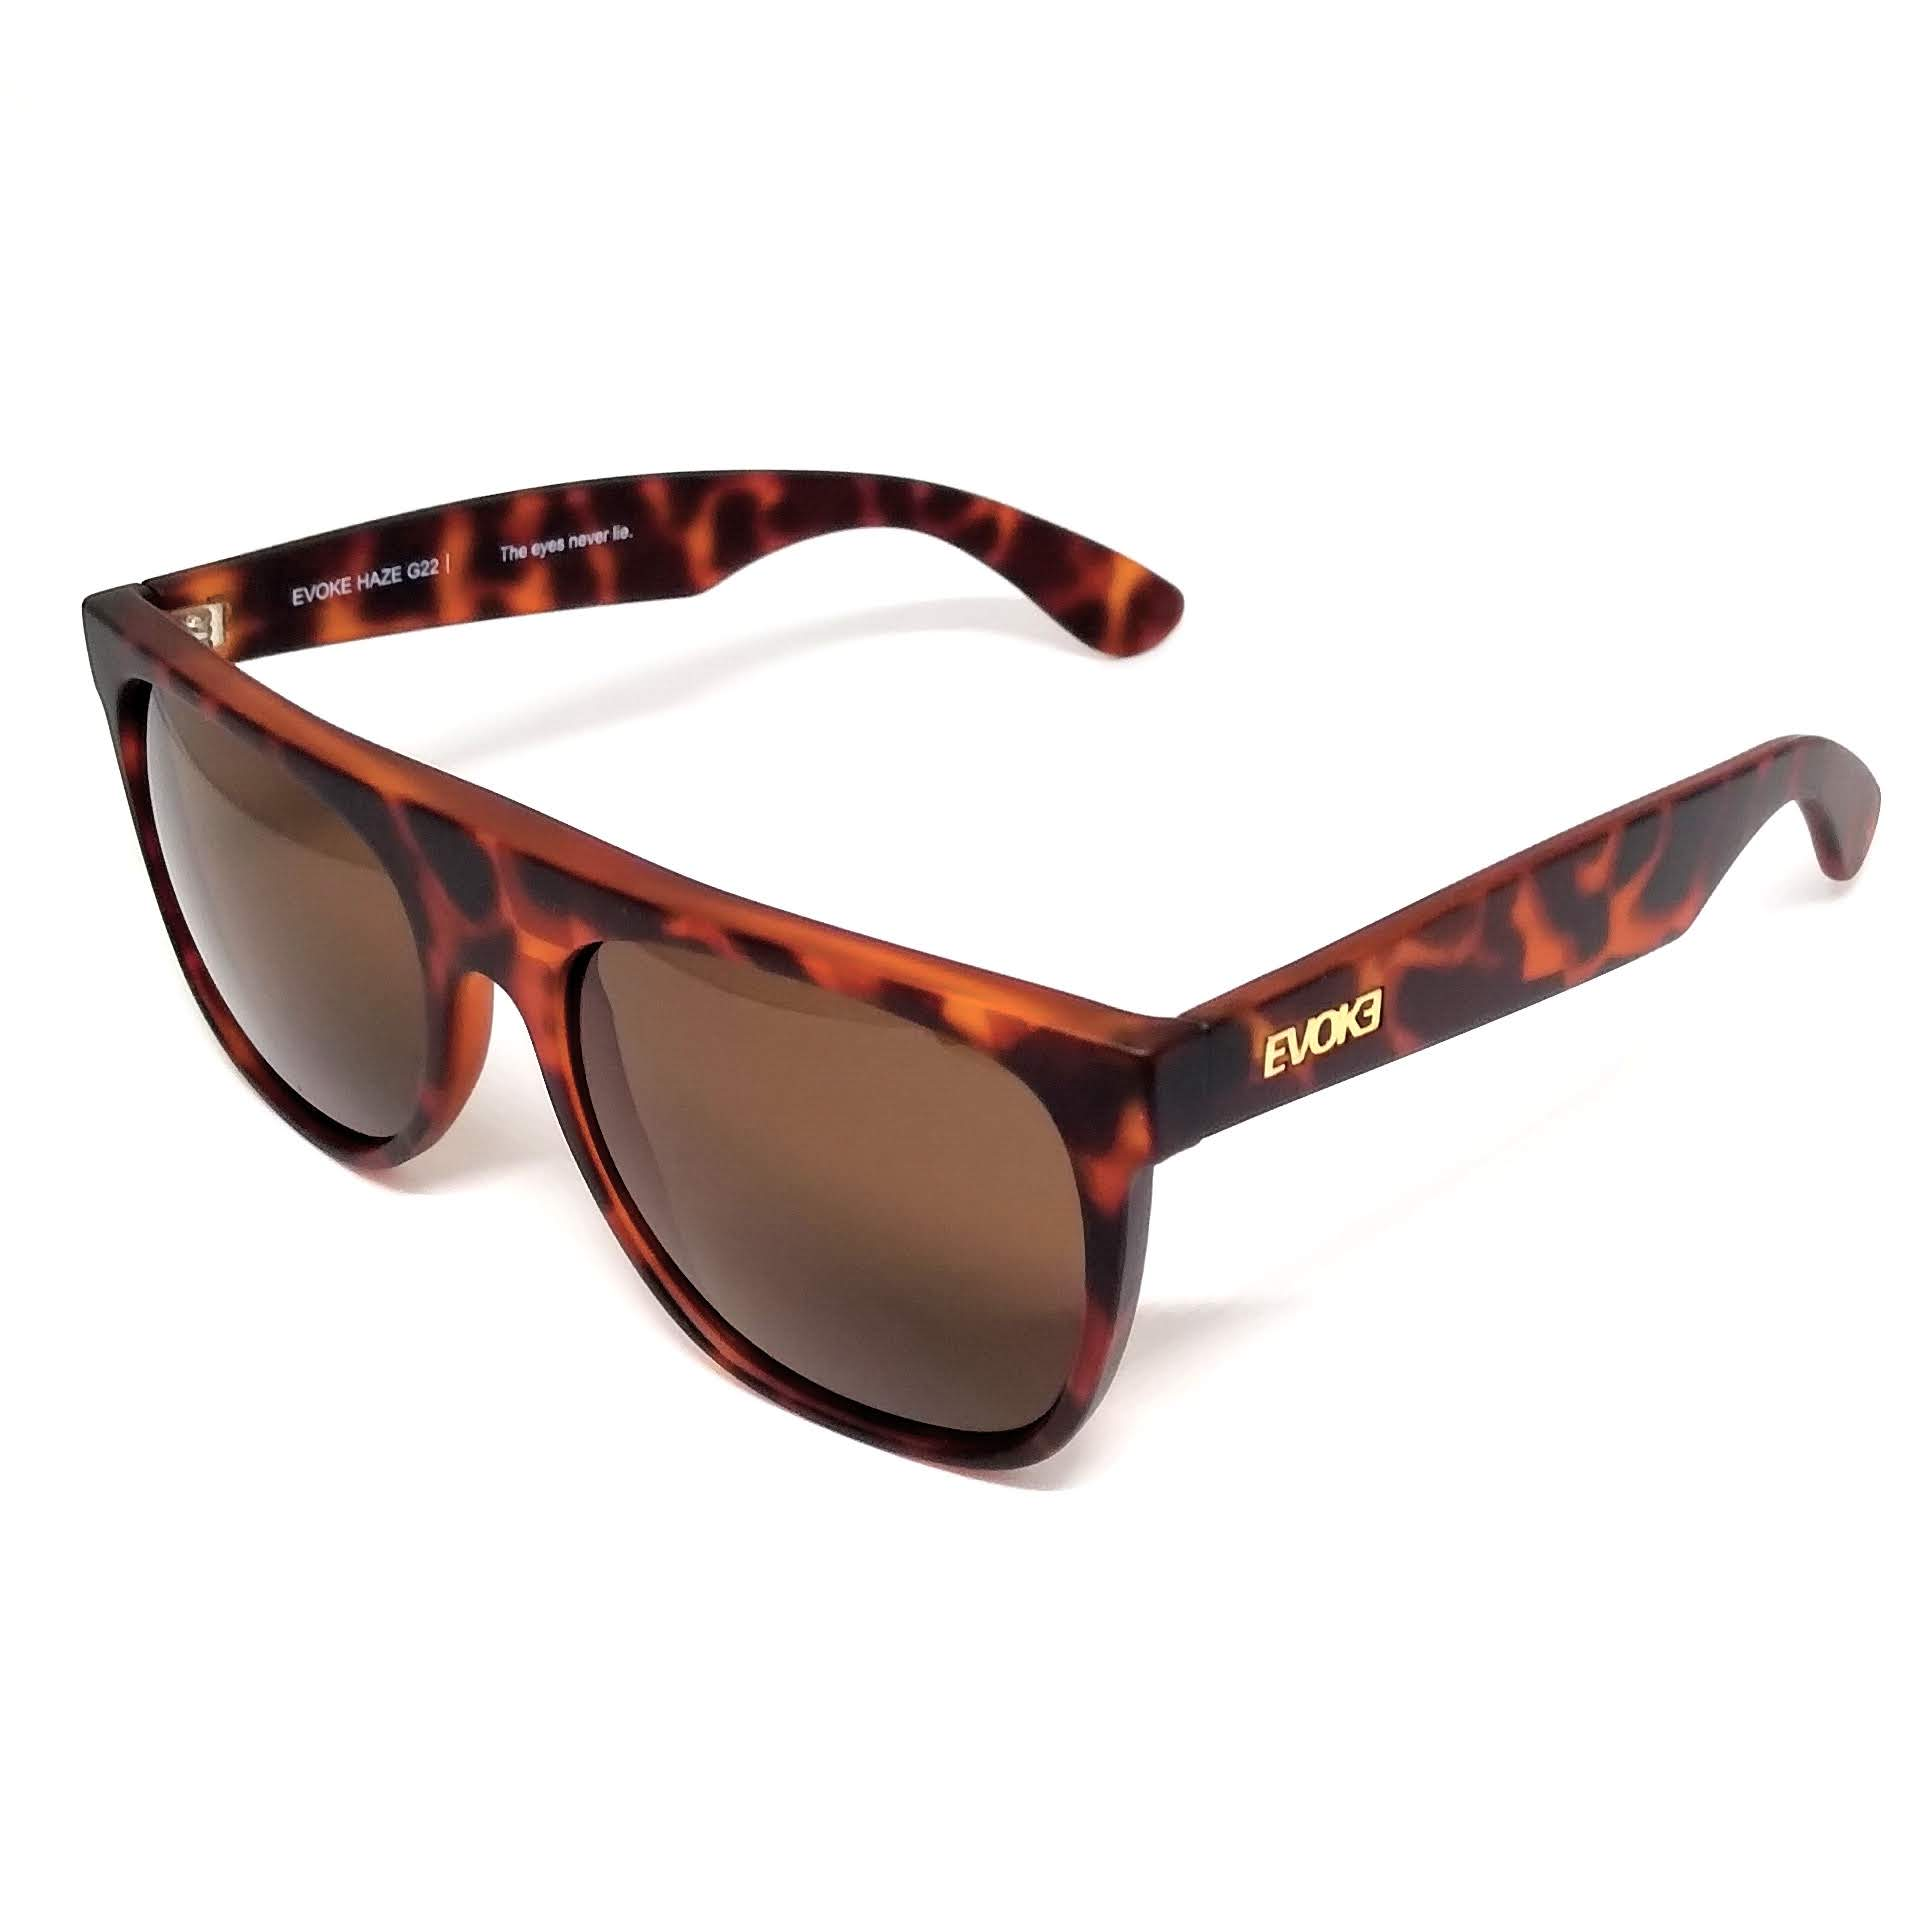 Óculos de Sol Evoke Haze g22 Turtle Demi Marrom Gold